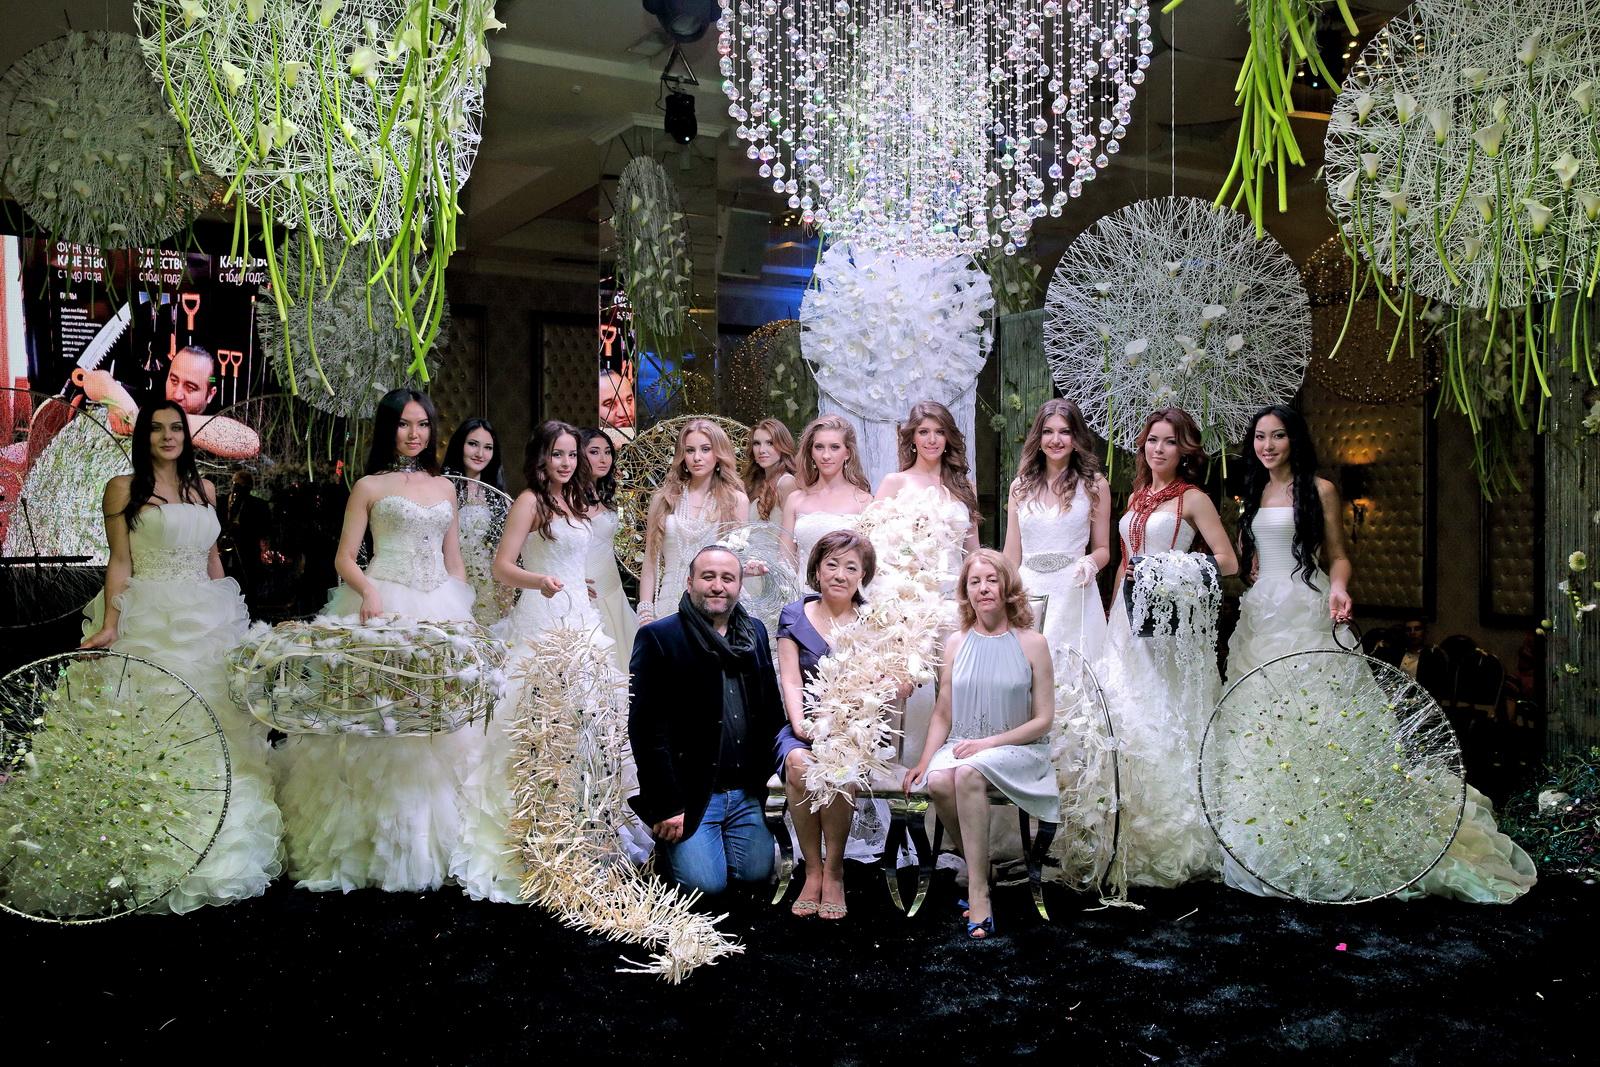 http://araikgalstyan.com/wp-content/uploads/2015/05/Floral-wedding-show-Bishkek-2015-Web_05211.jpg